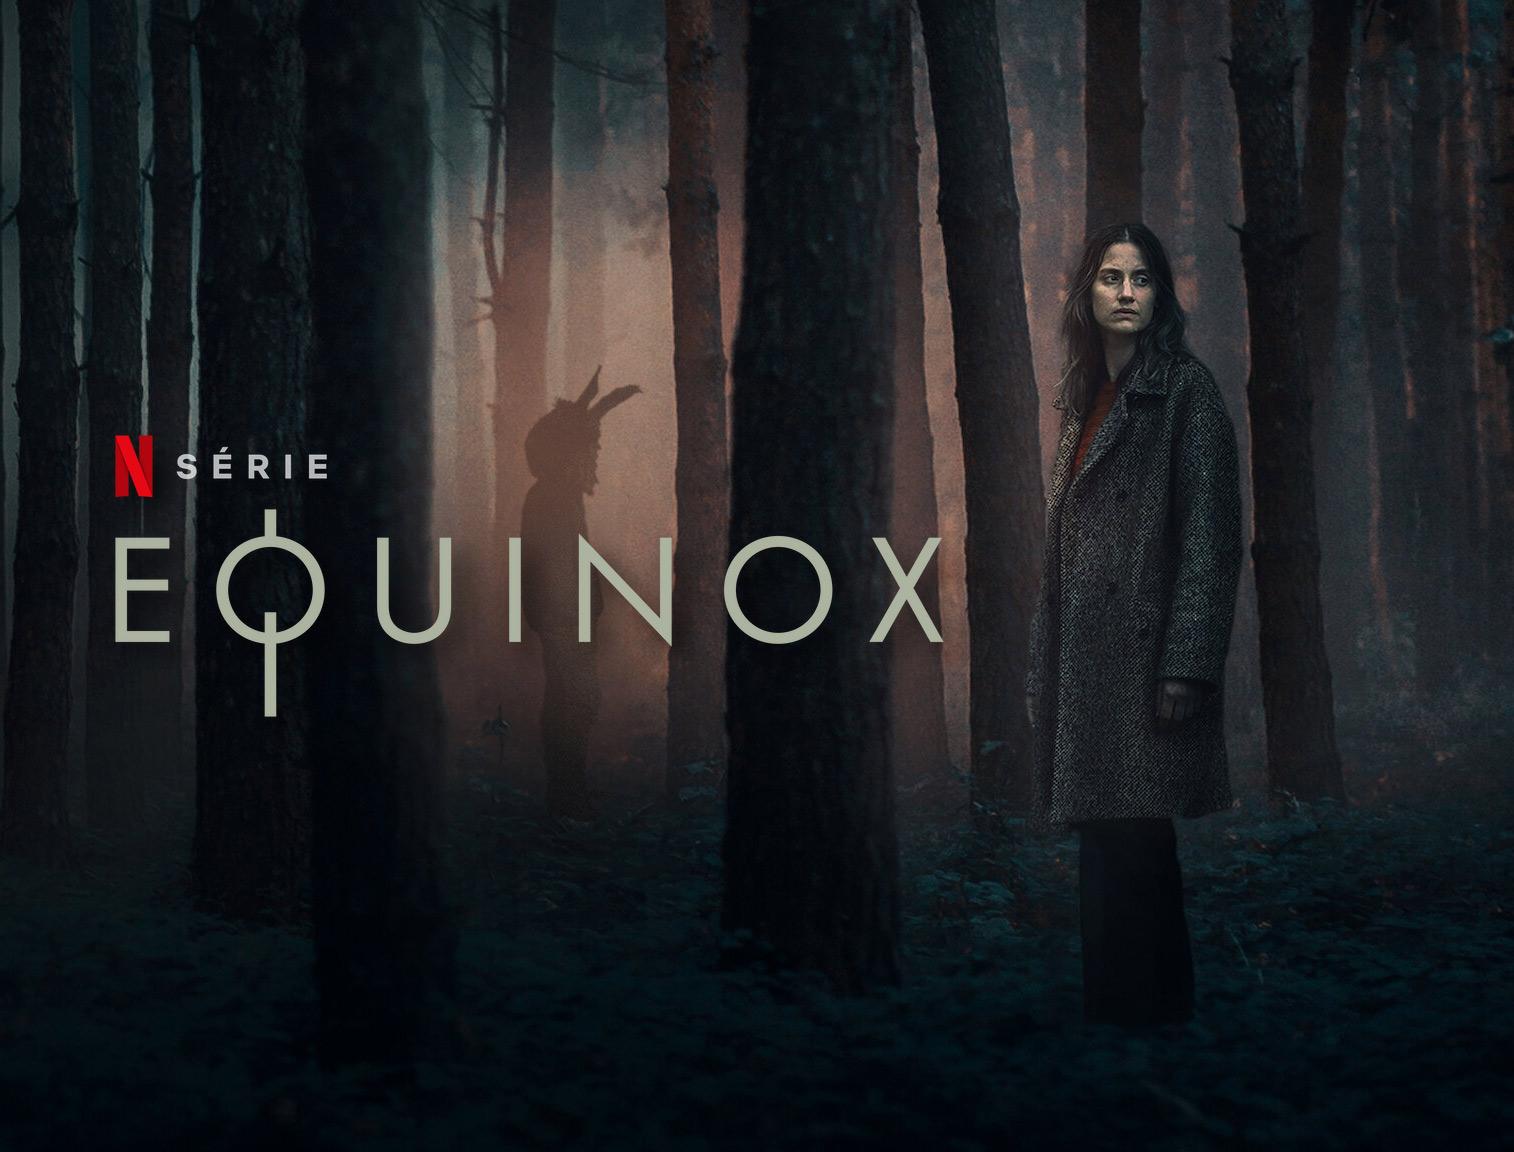 equinox-poster-netflix-series